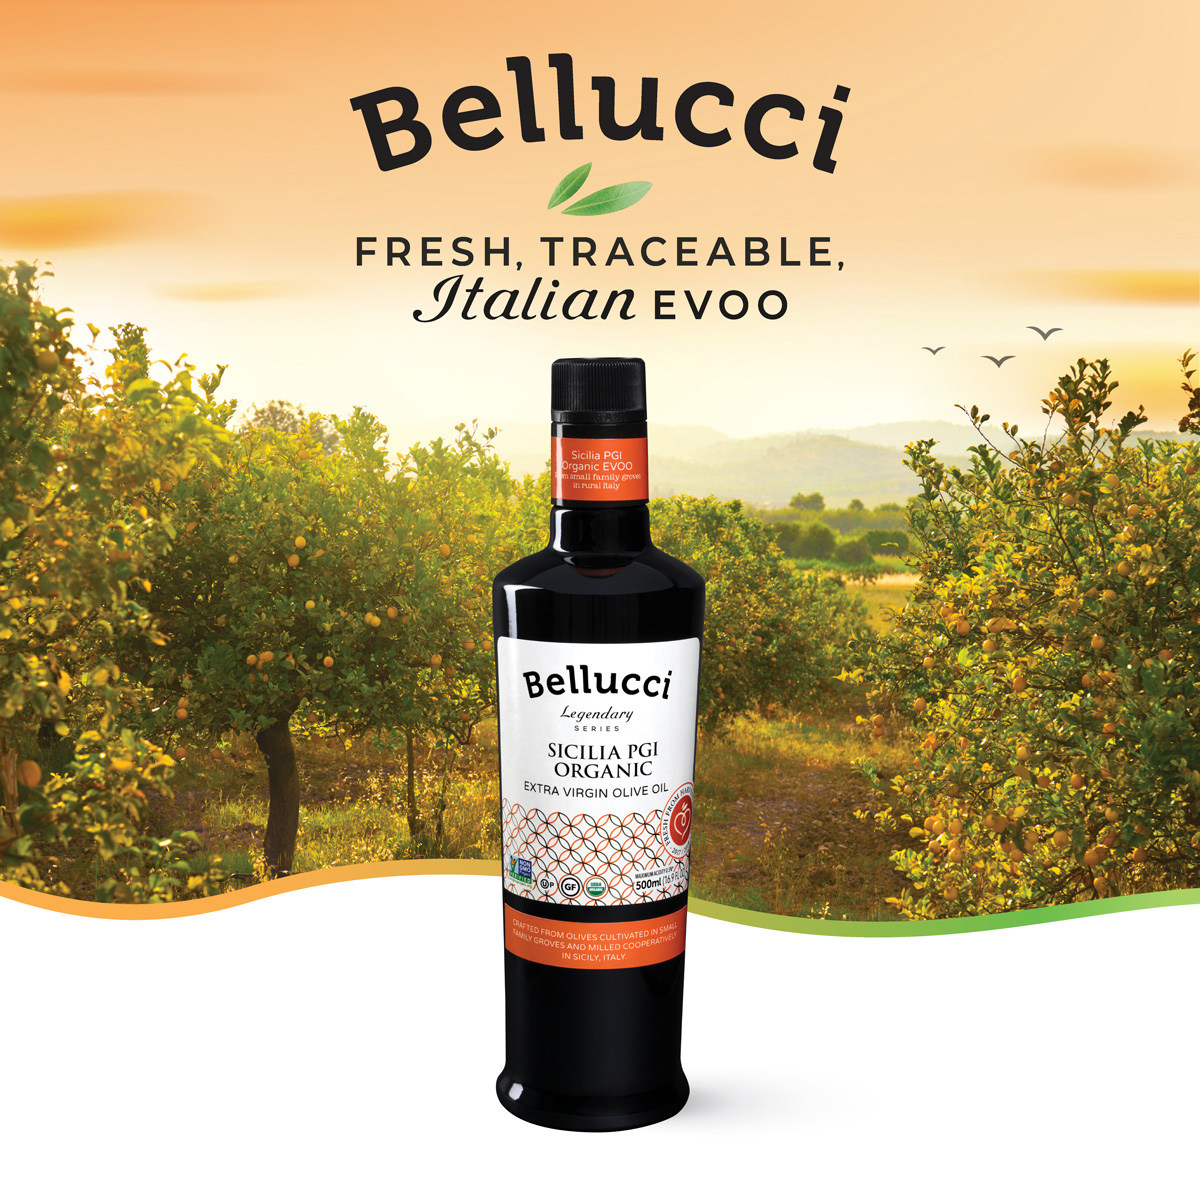 Bellucci Legendary Series – Sicilia PGI Organic EVOO